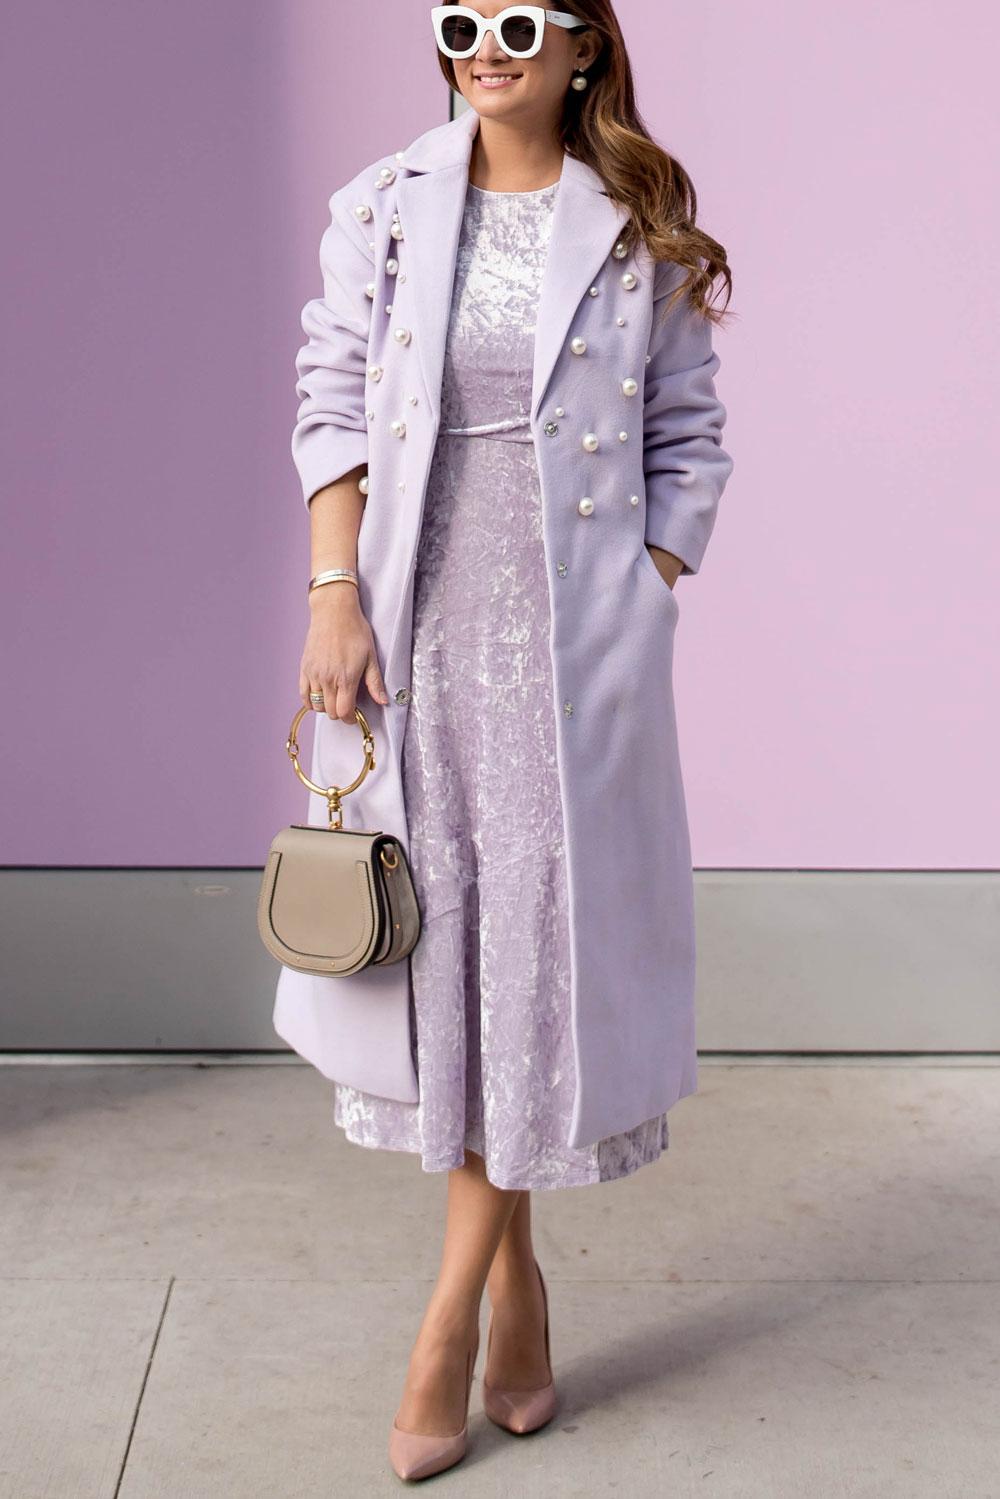 Pearl Embellished Lilac Coat And Velvet Midi Dress